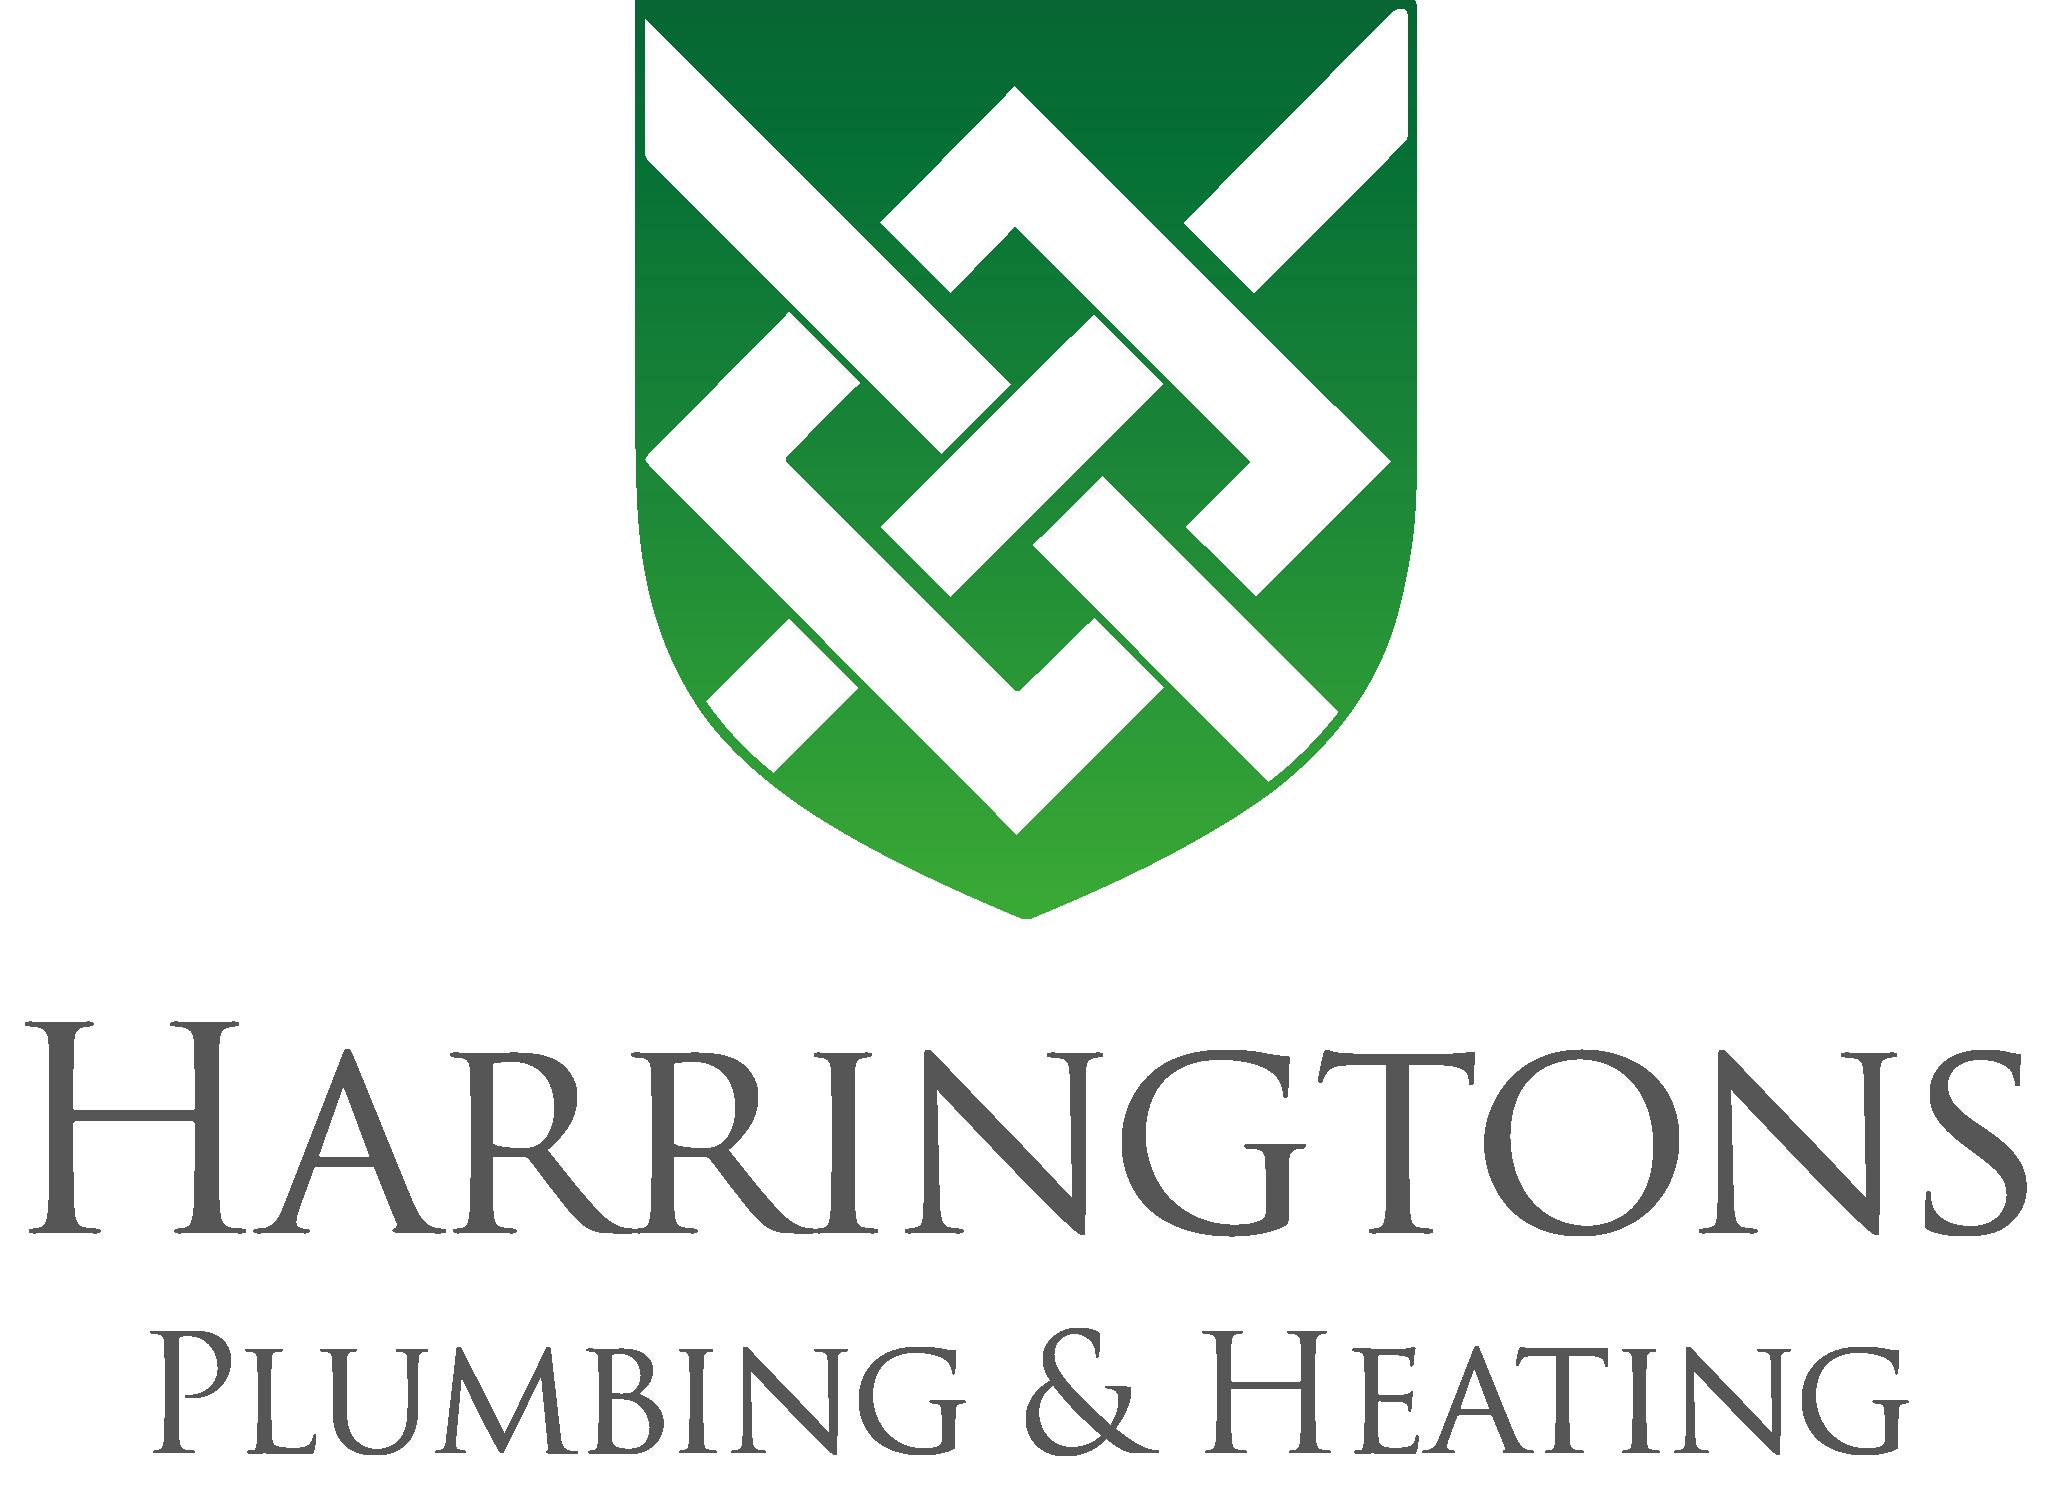 Harringtons Plumbing new logo green